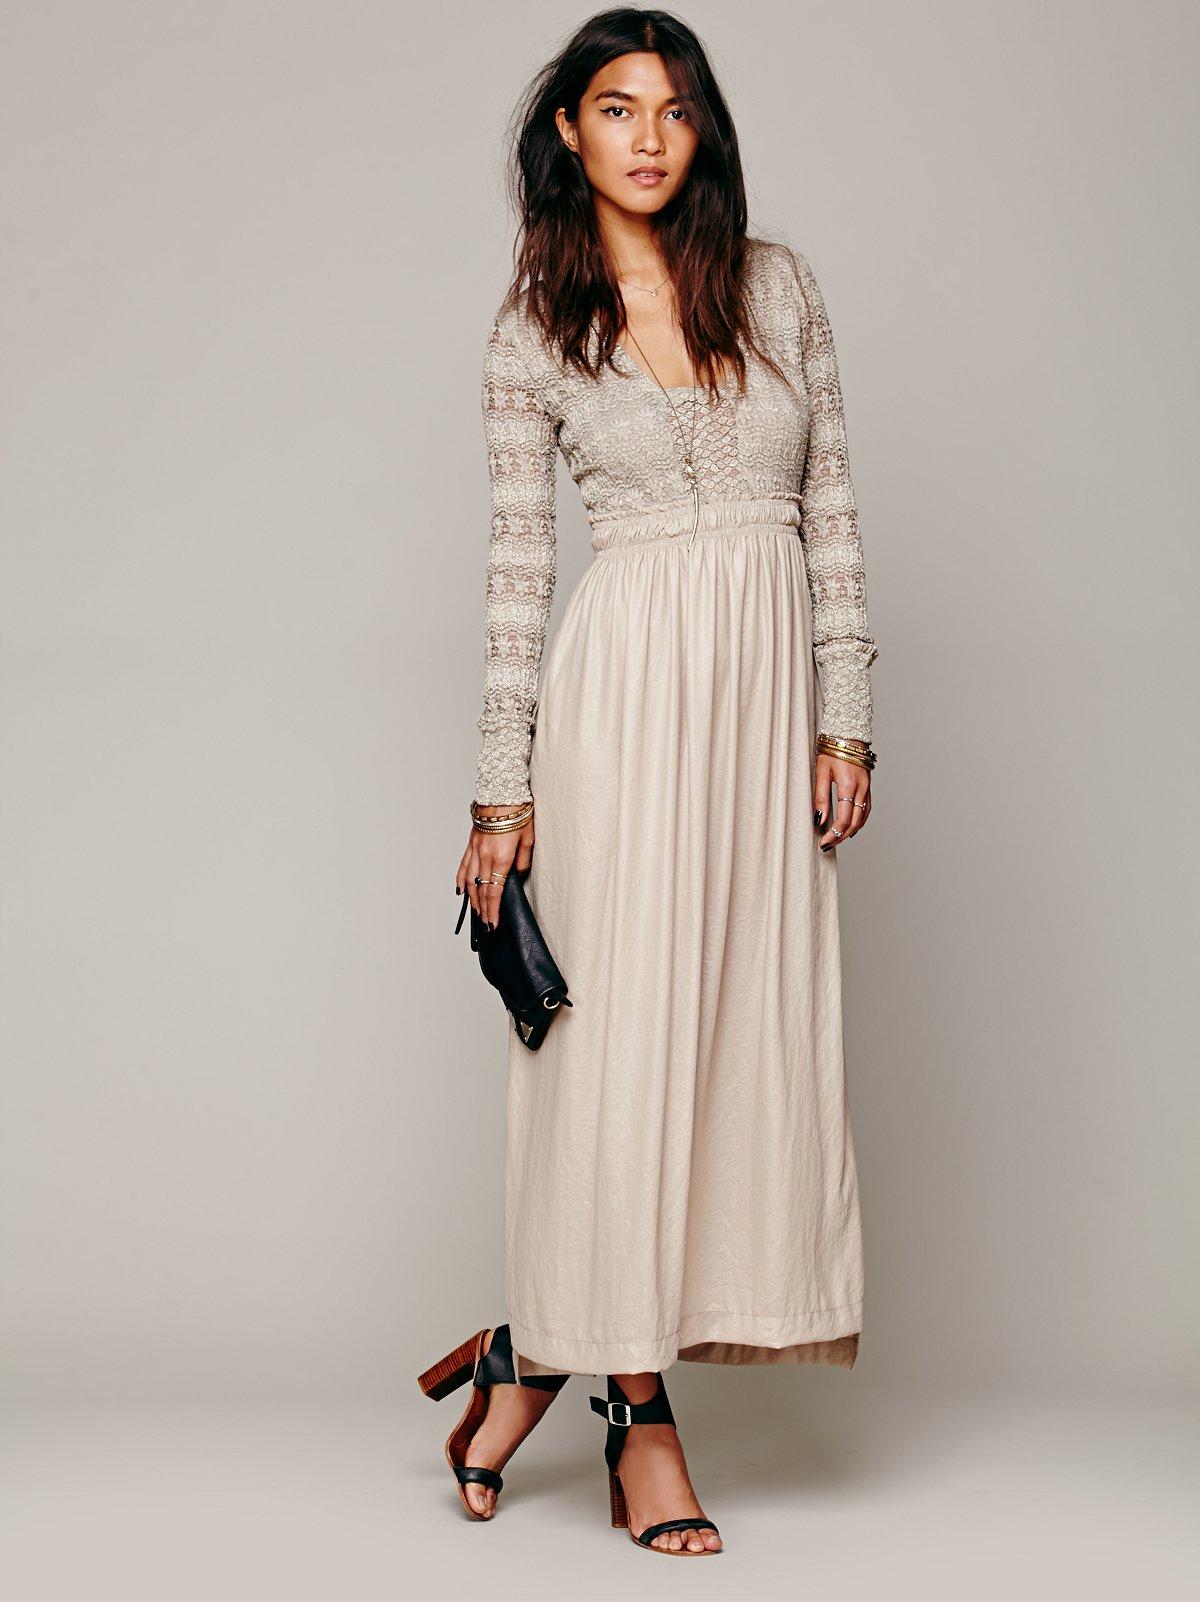 Fair Maiden Maxi Dress